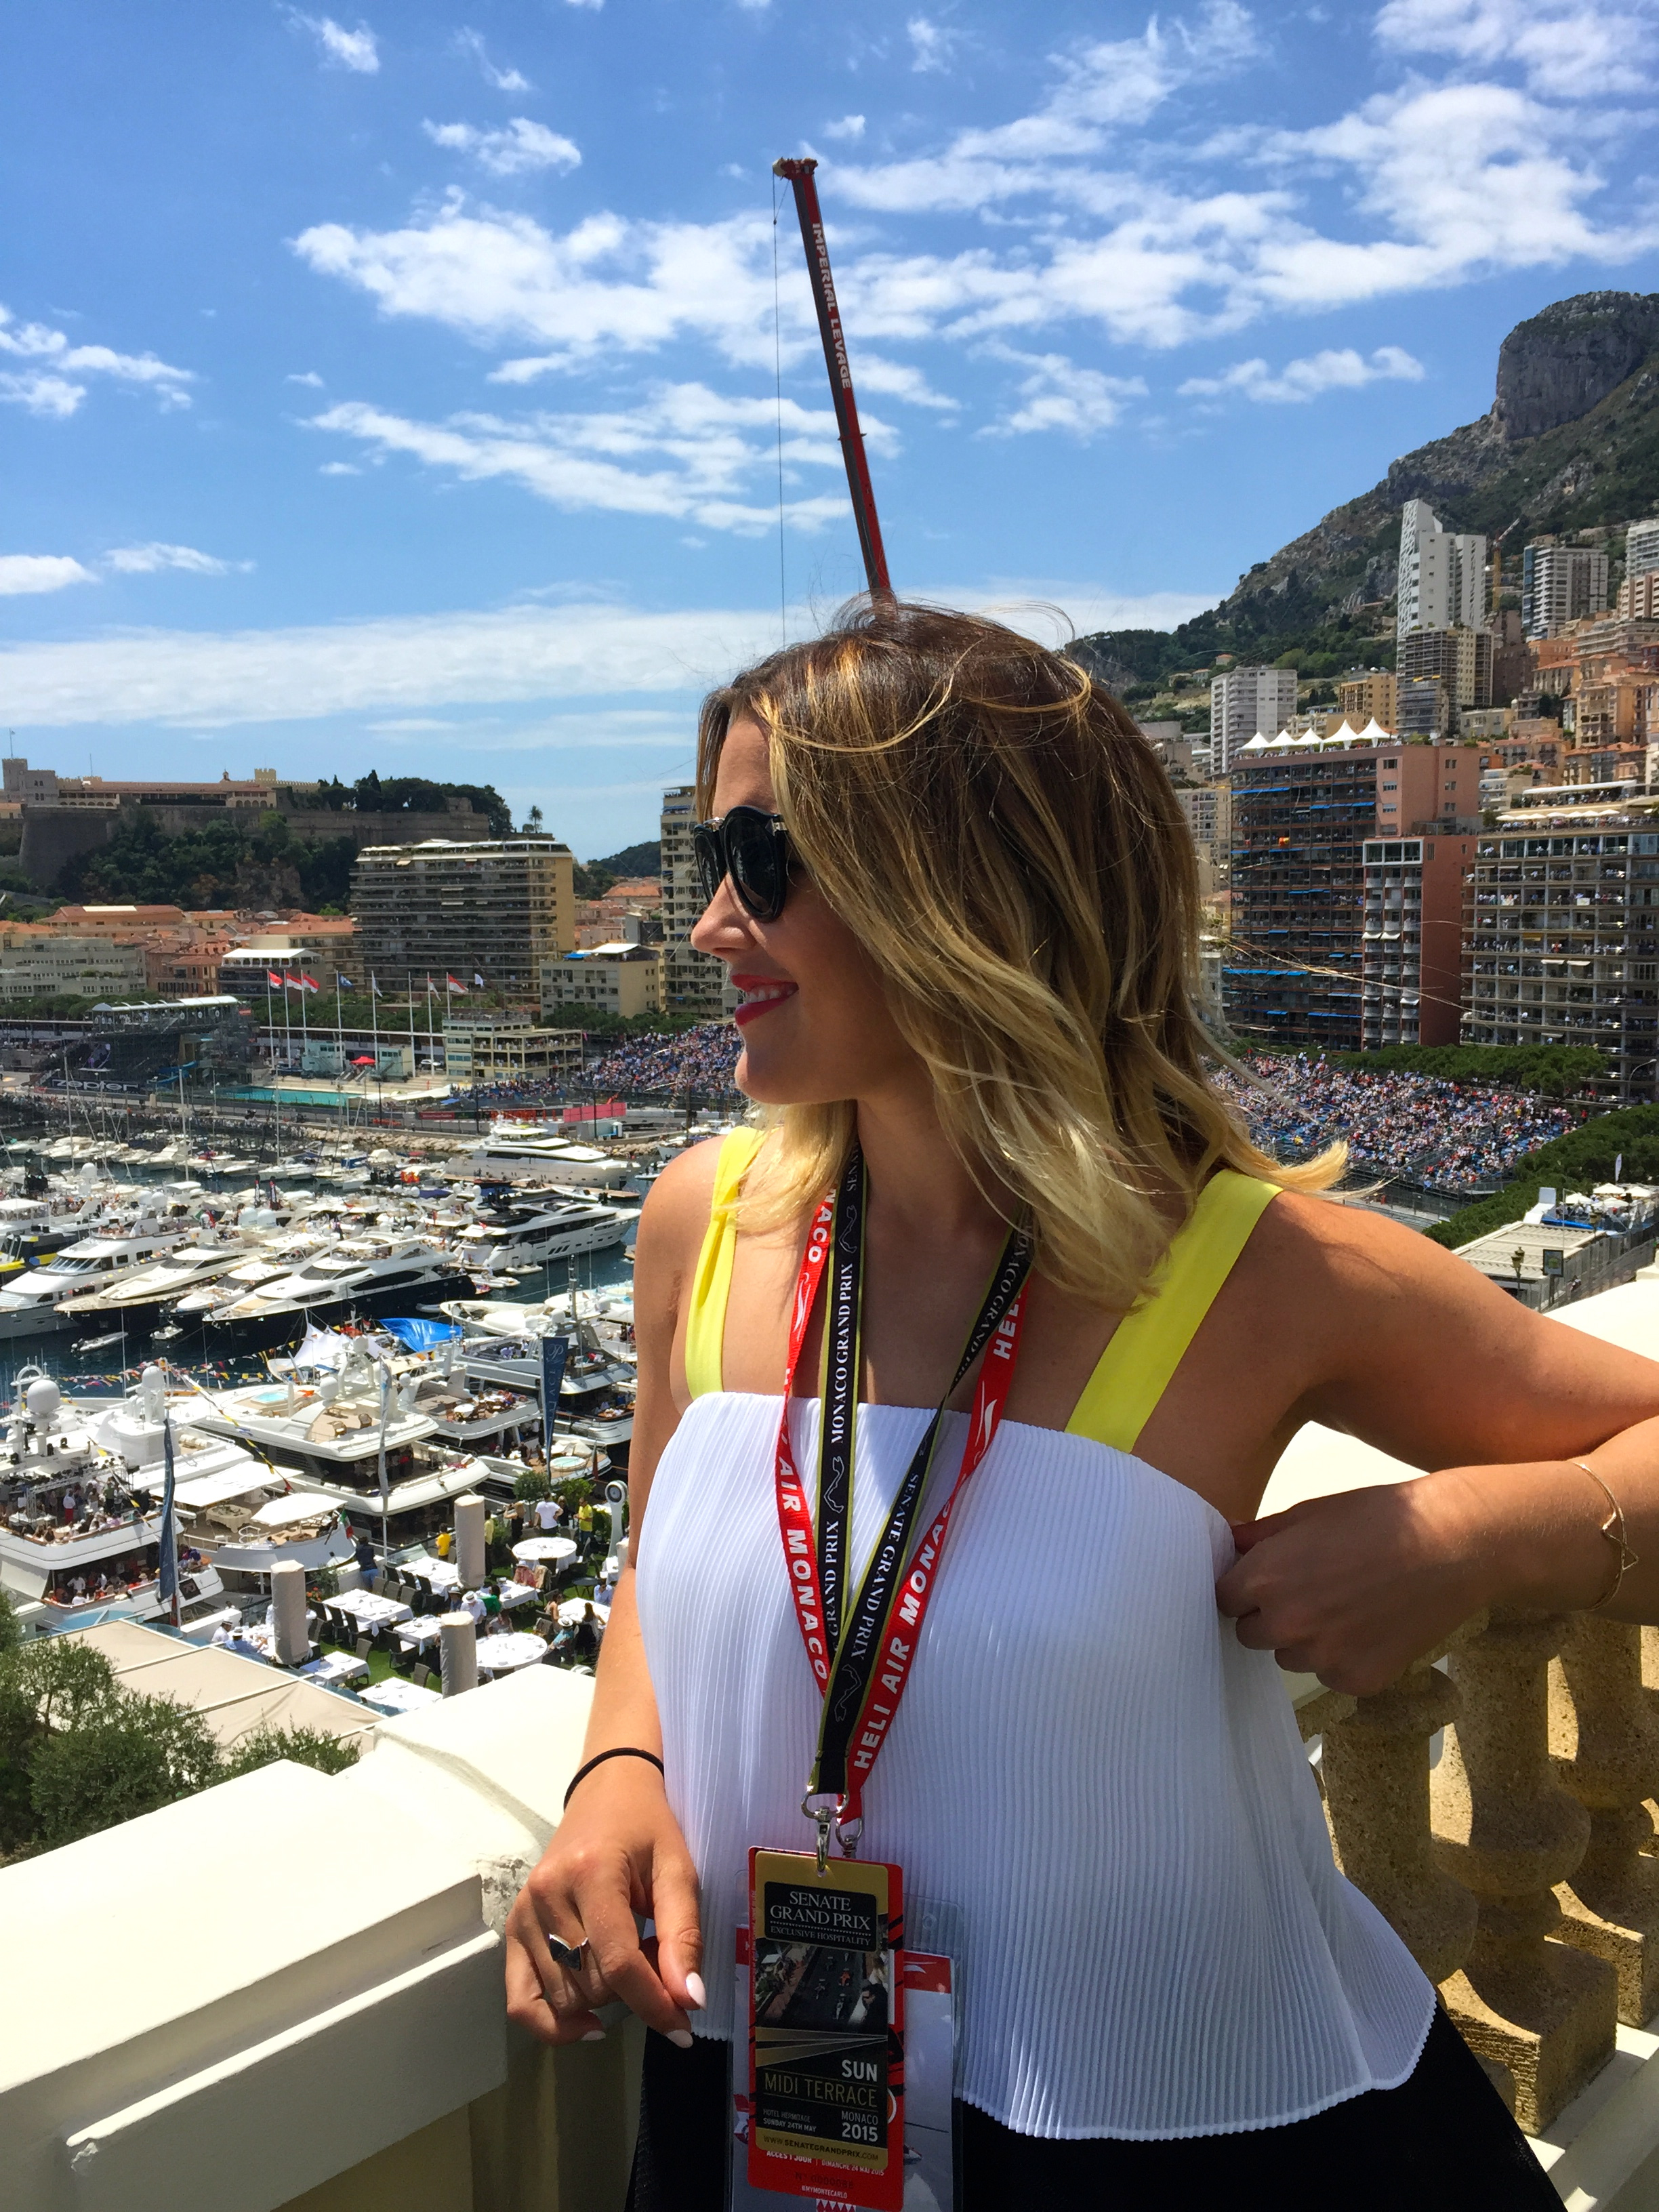 Taking in the view, Midi Terrace, Hotel Hermitage, Monaco.